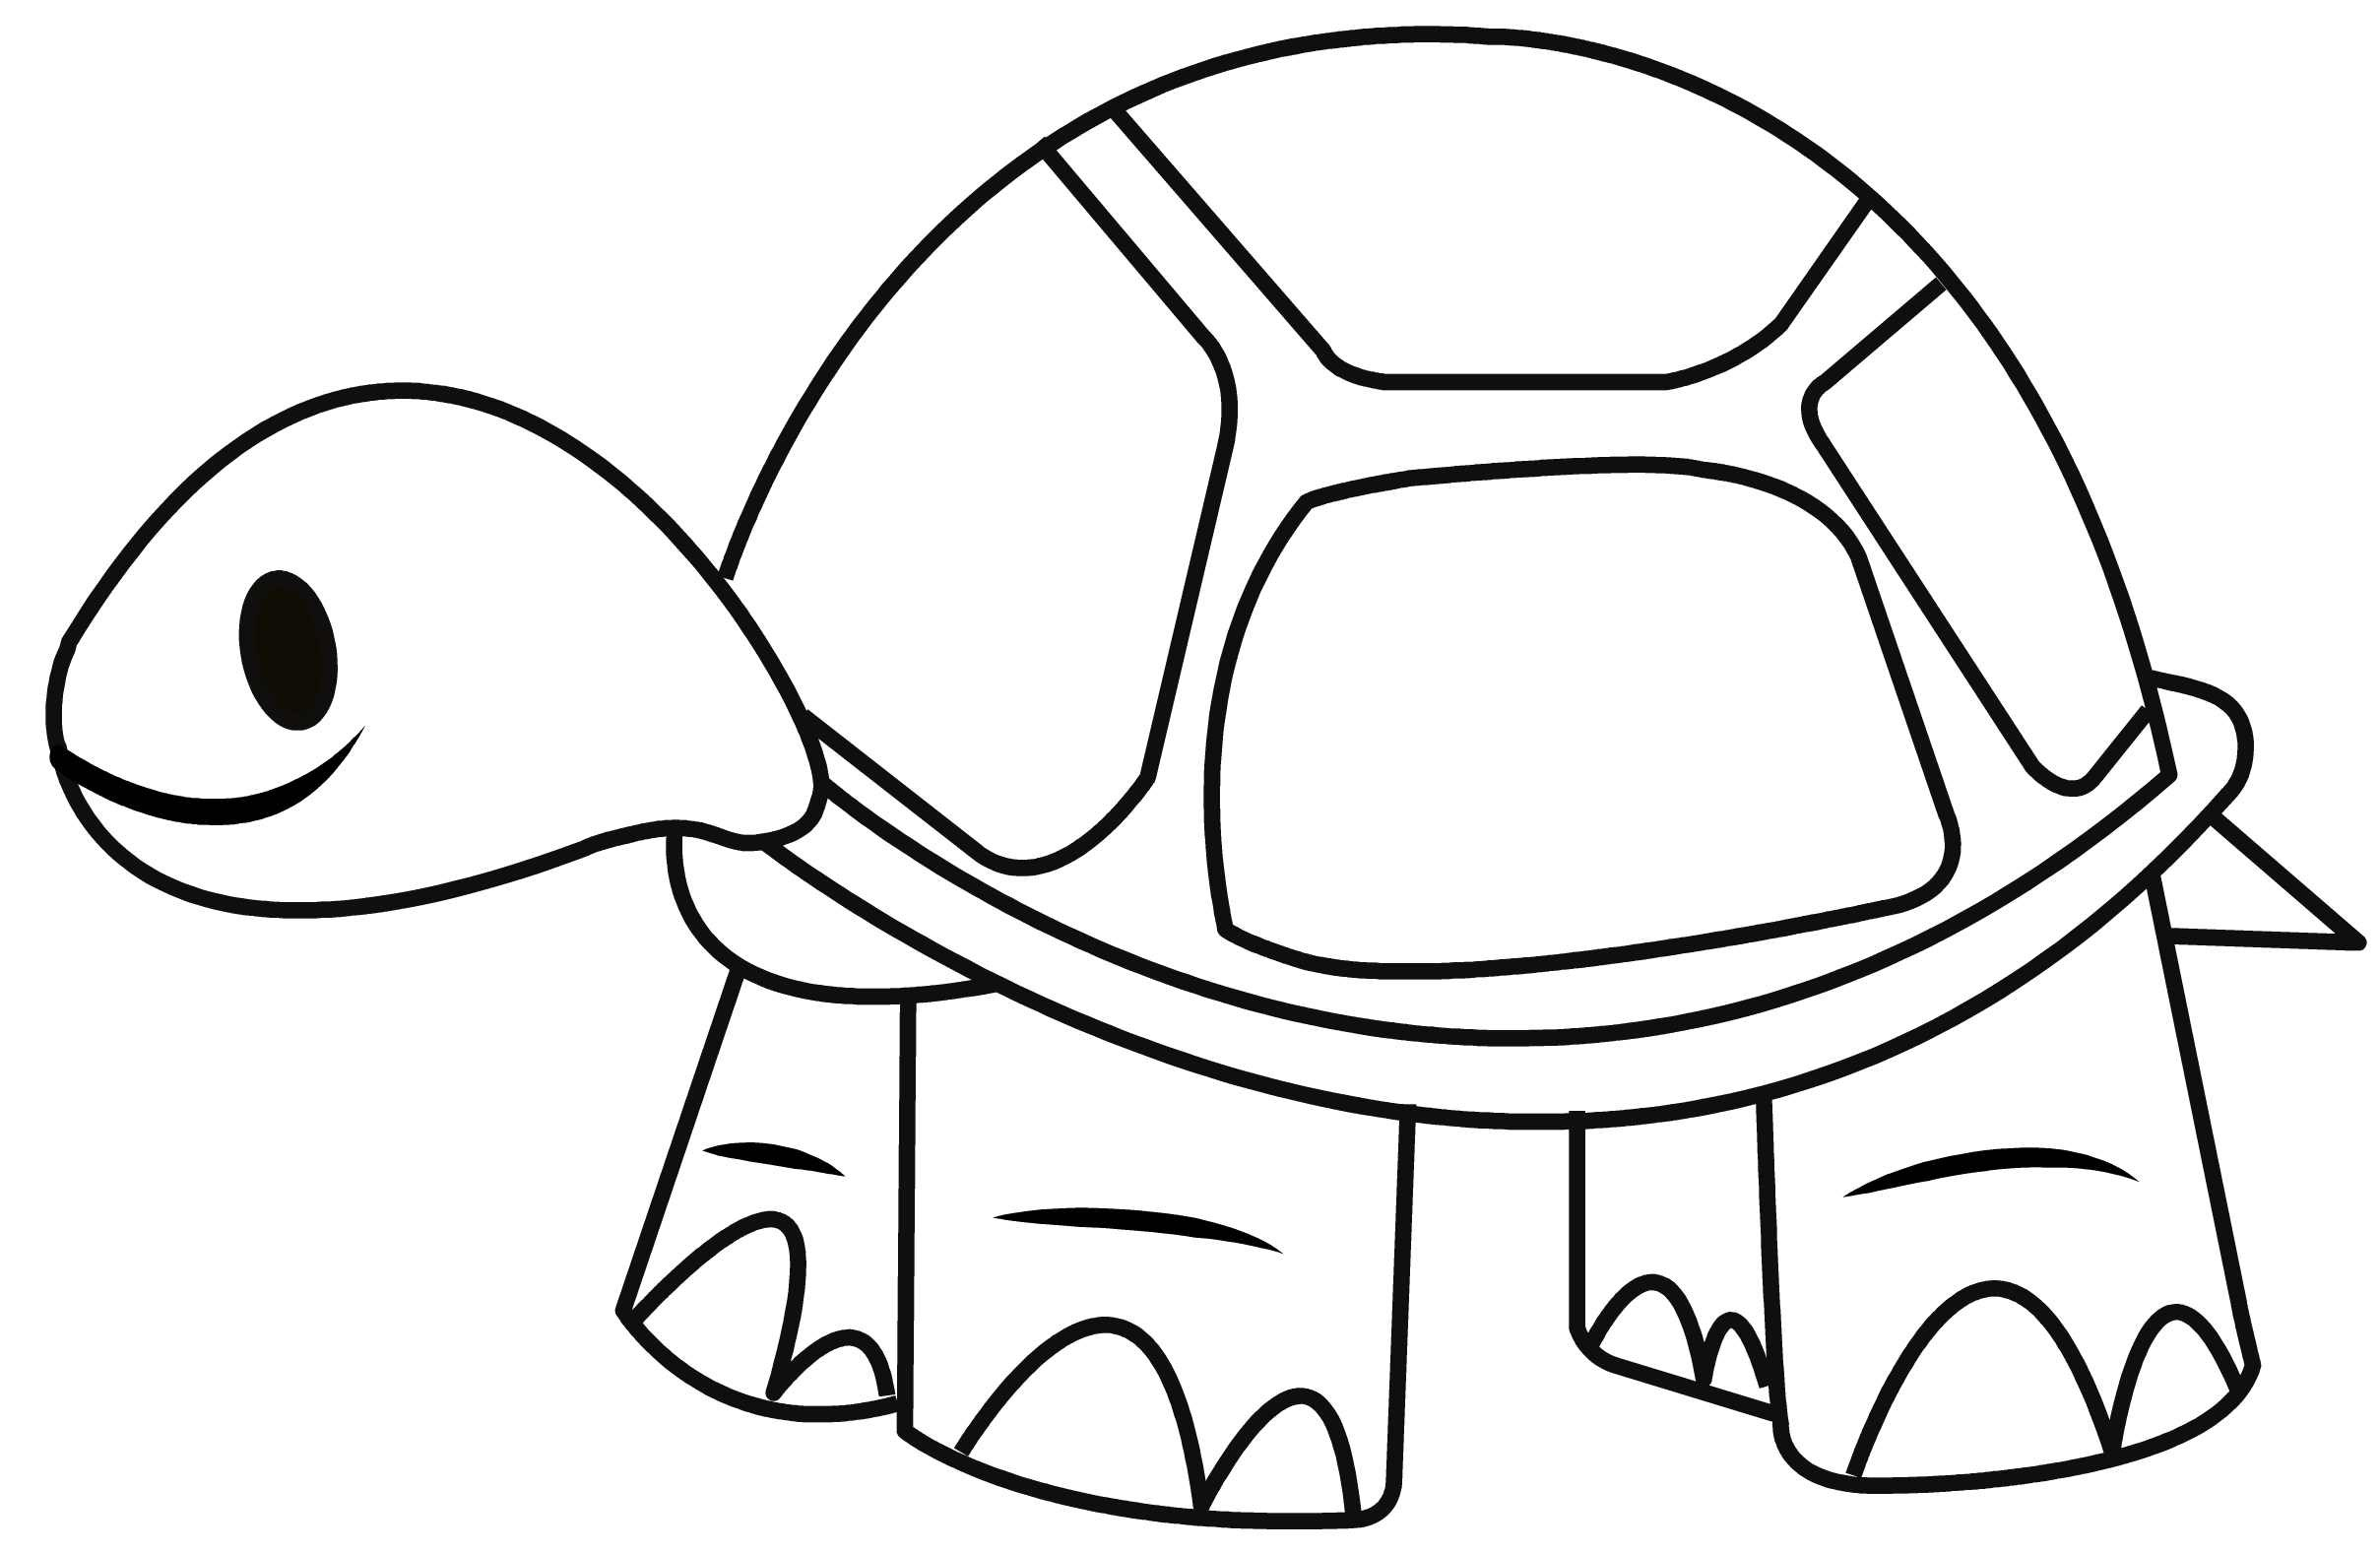 2417x1577 How To Draw A Tortoise